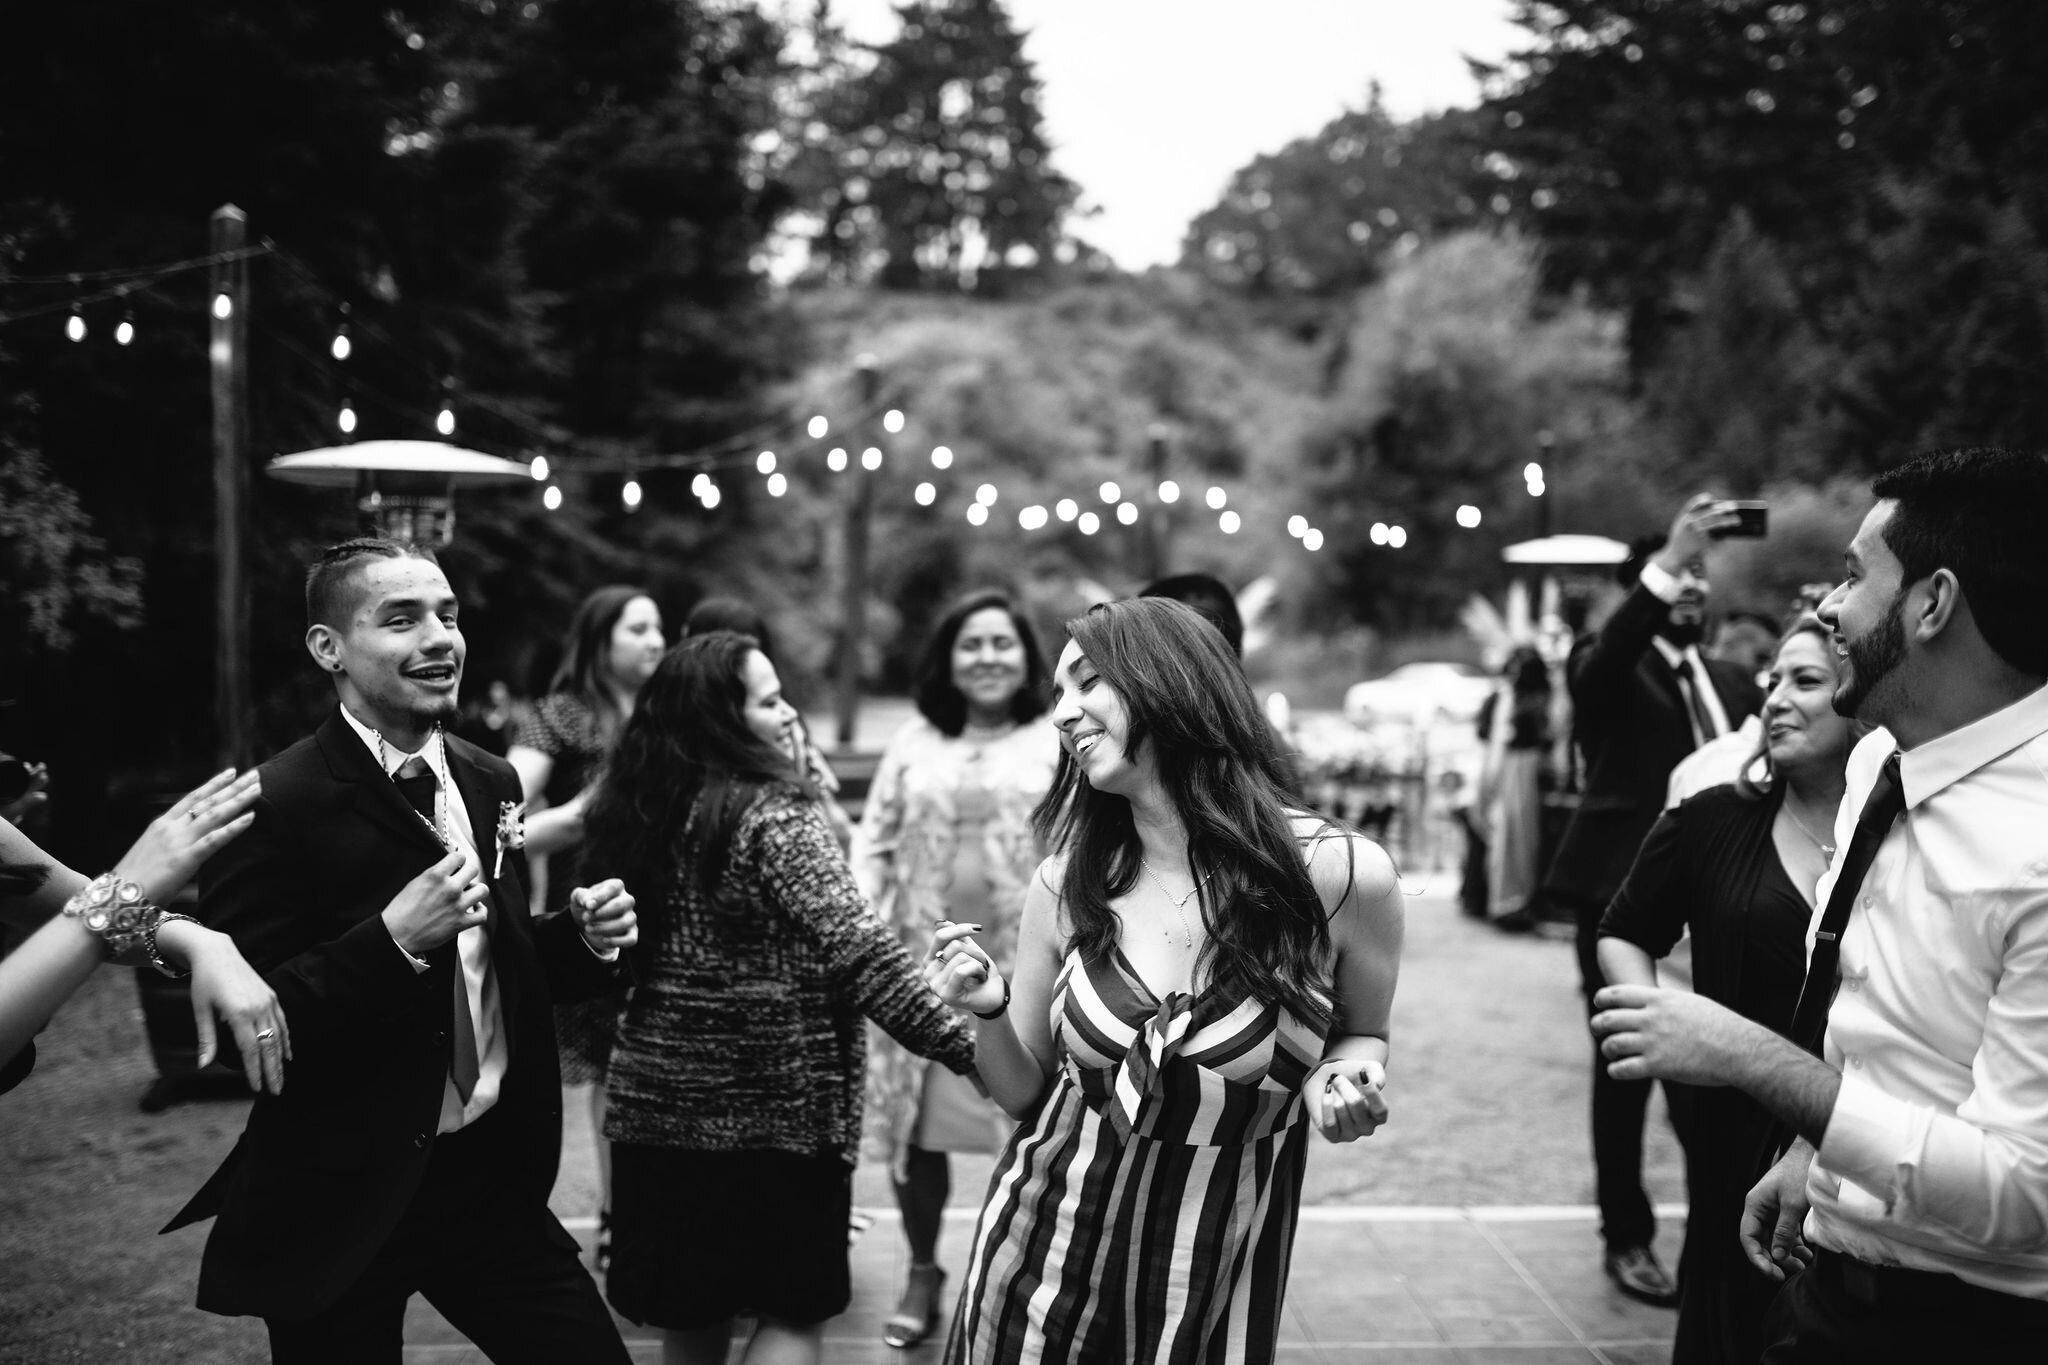 Venture-Retreat-Center-Wedding-Pescadero-Sat-Aaron-Pritam-The-Shalom-Imaginative-749.jpg